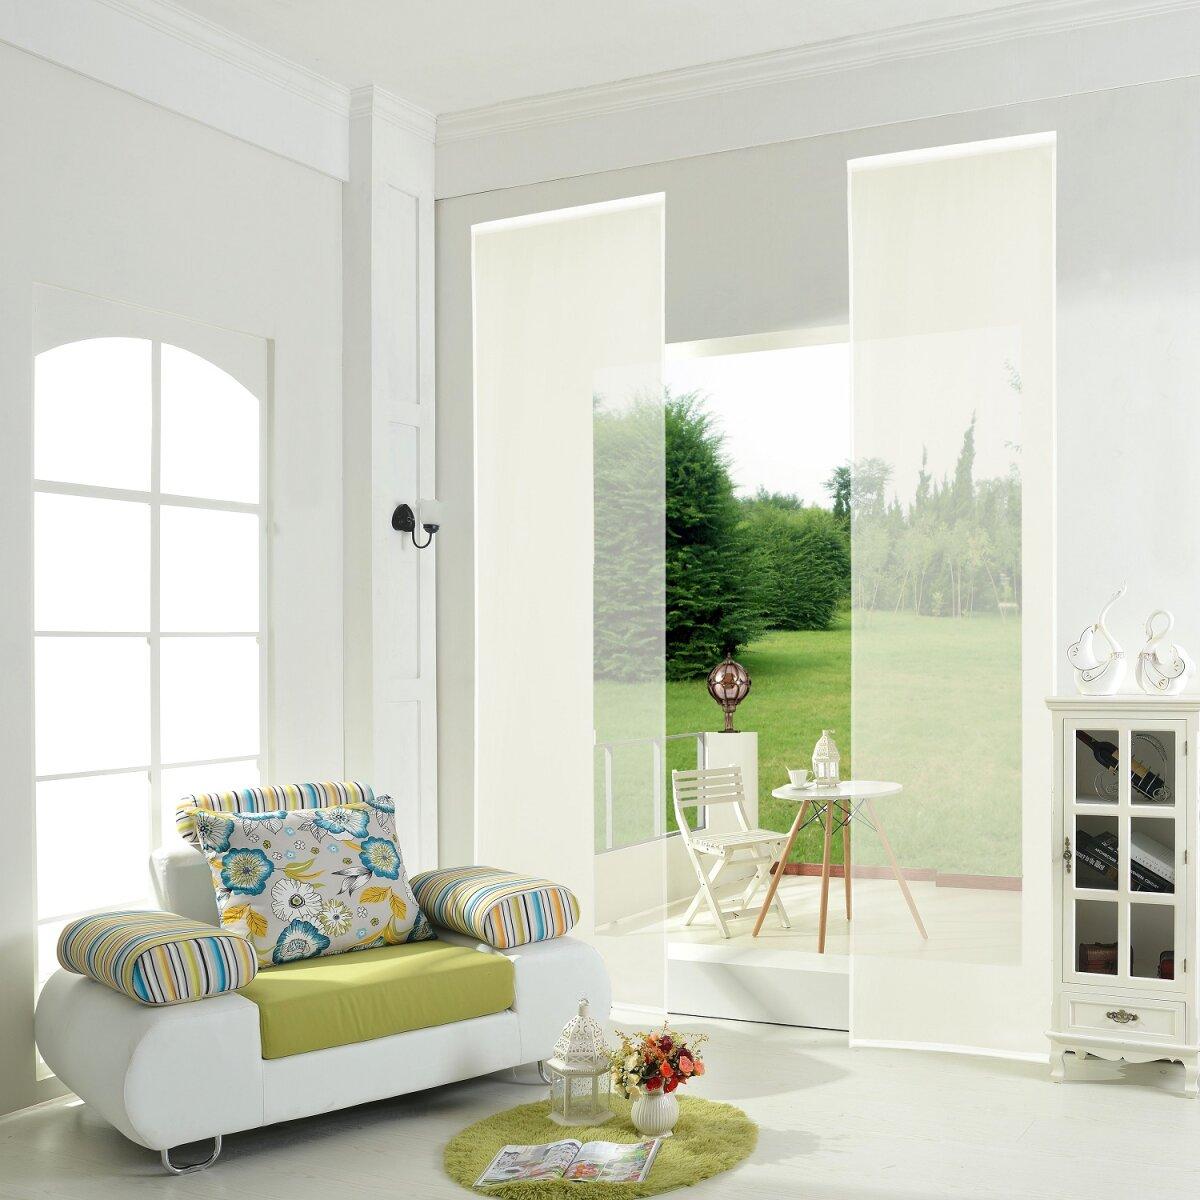 855892 creme 2er pack schiebepanel schiebegardine. Black Bedroom Furniture Sets. Home Design Ideas